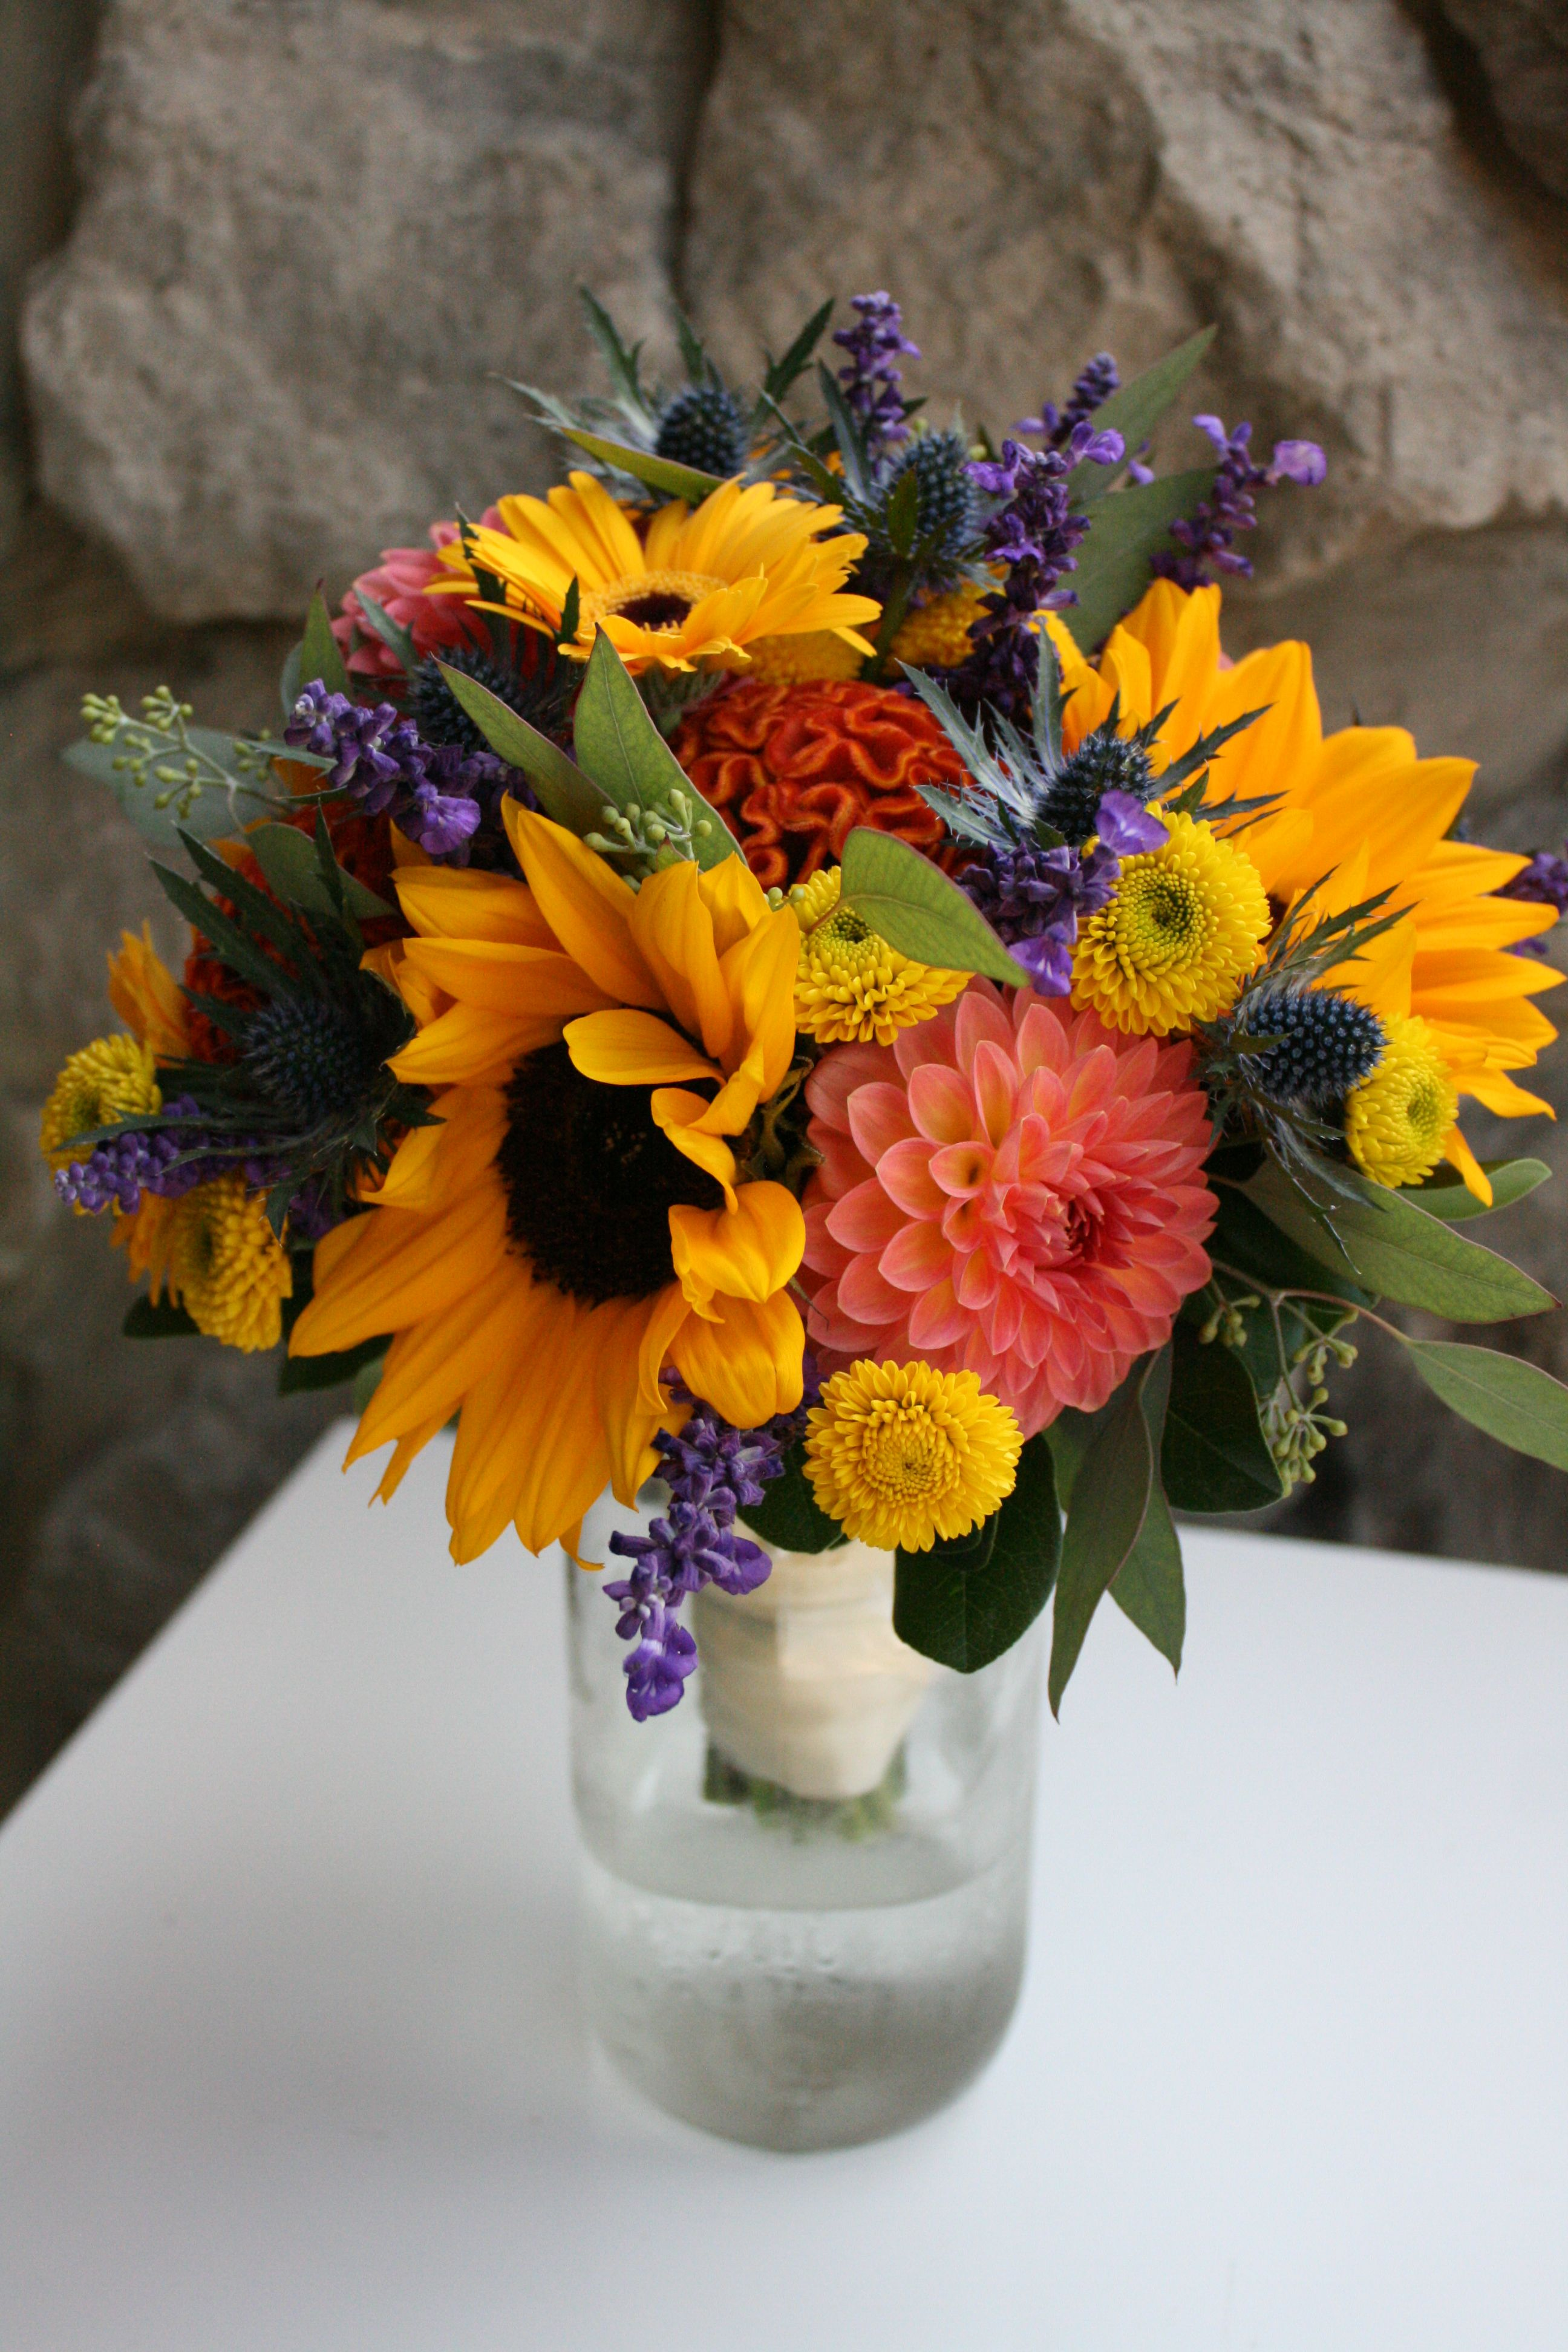 Summer Bouquet Of Dahlia Sunflowers Celosia And Salvia